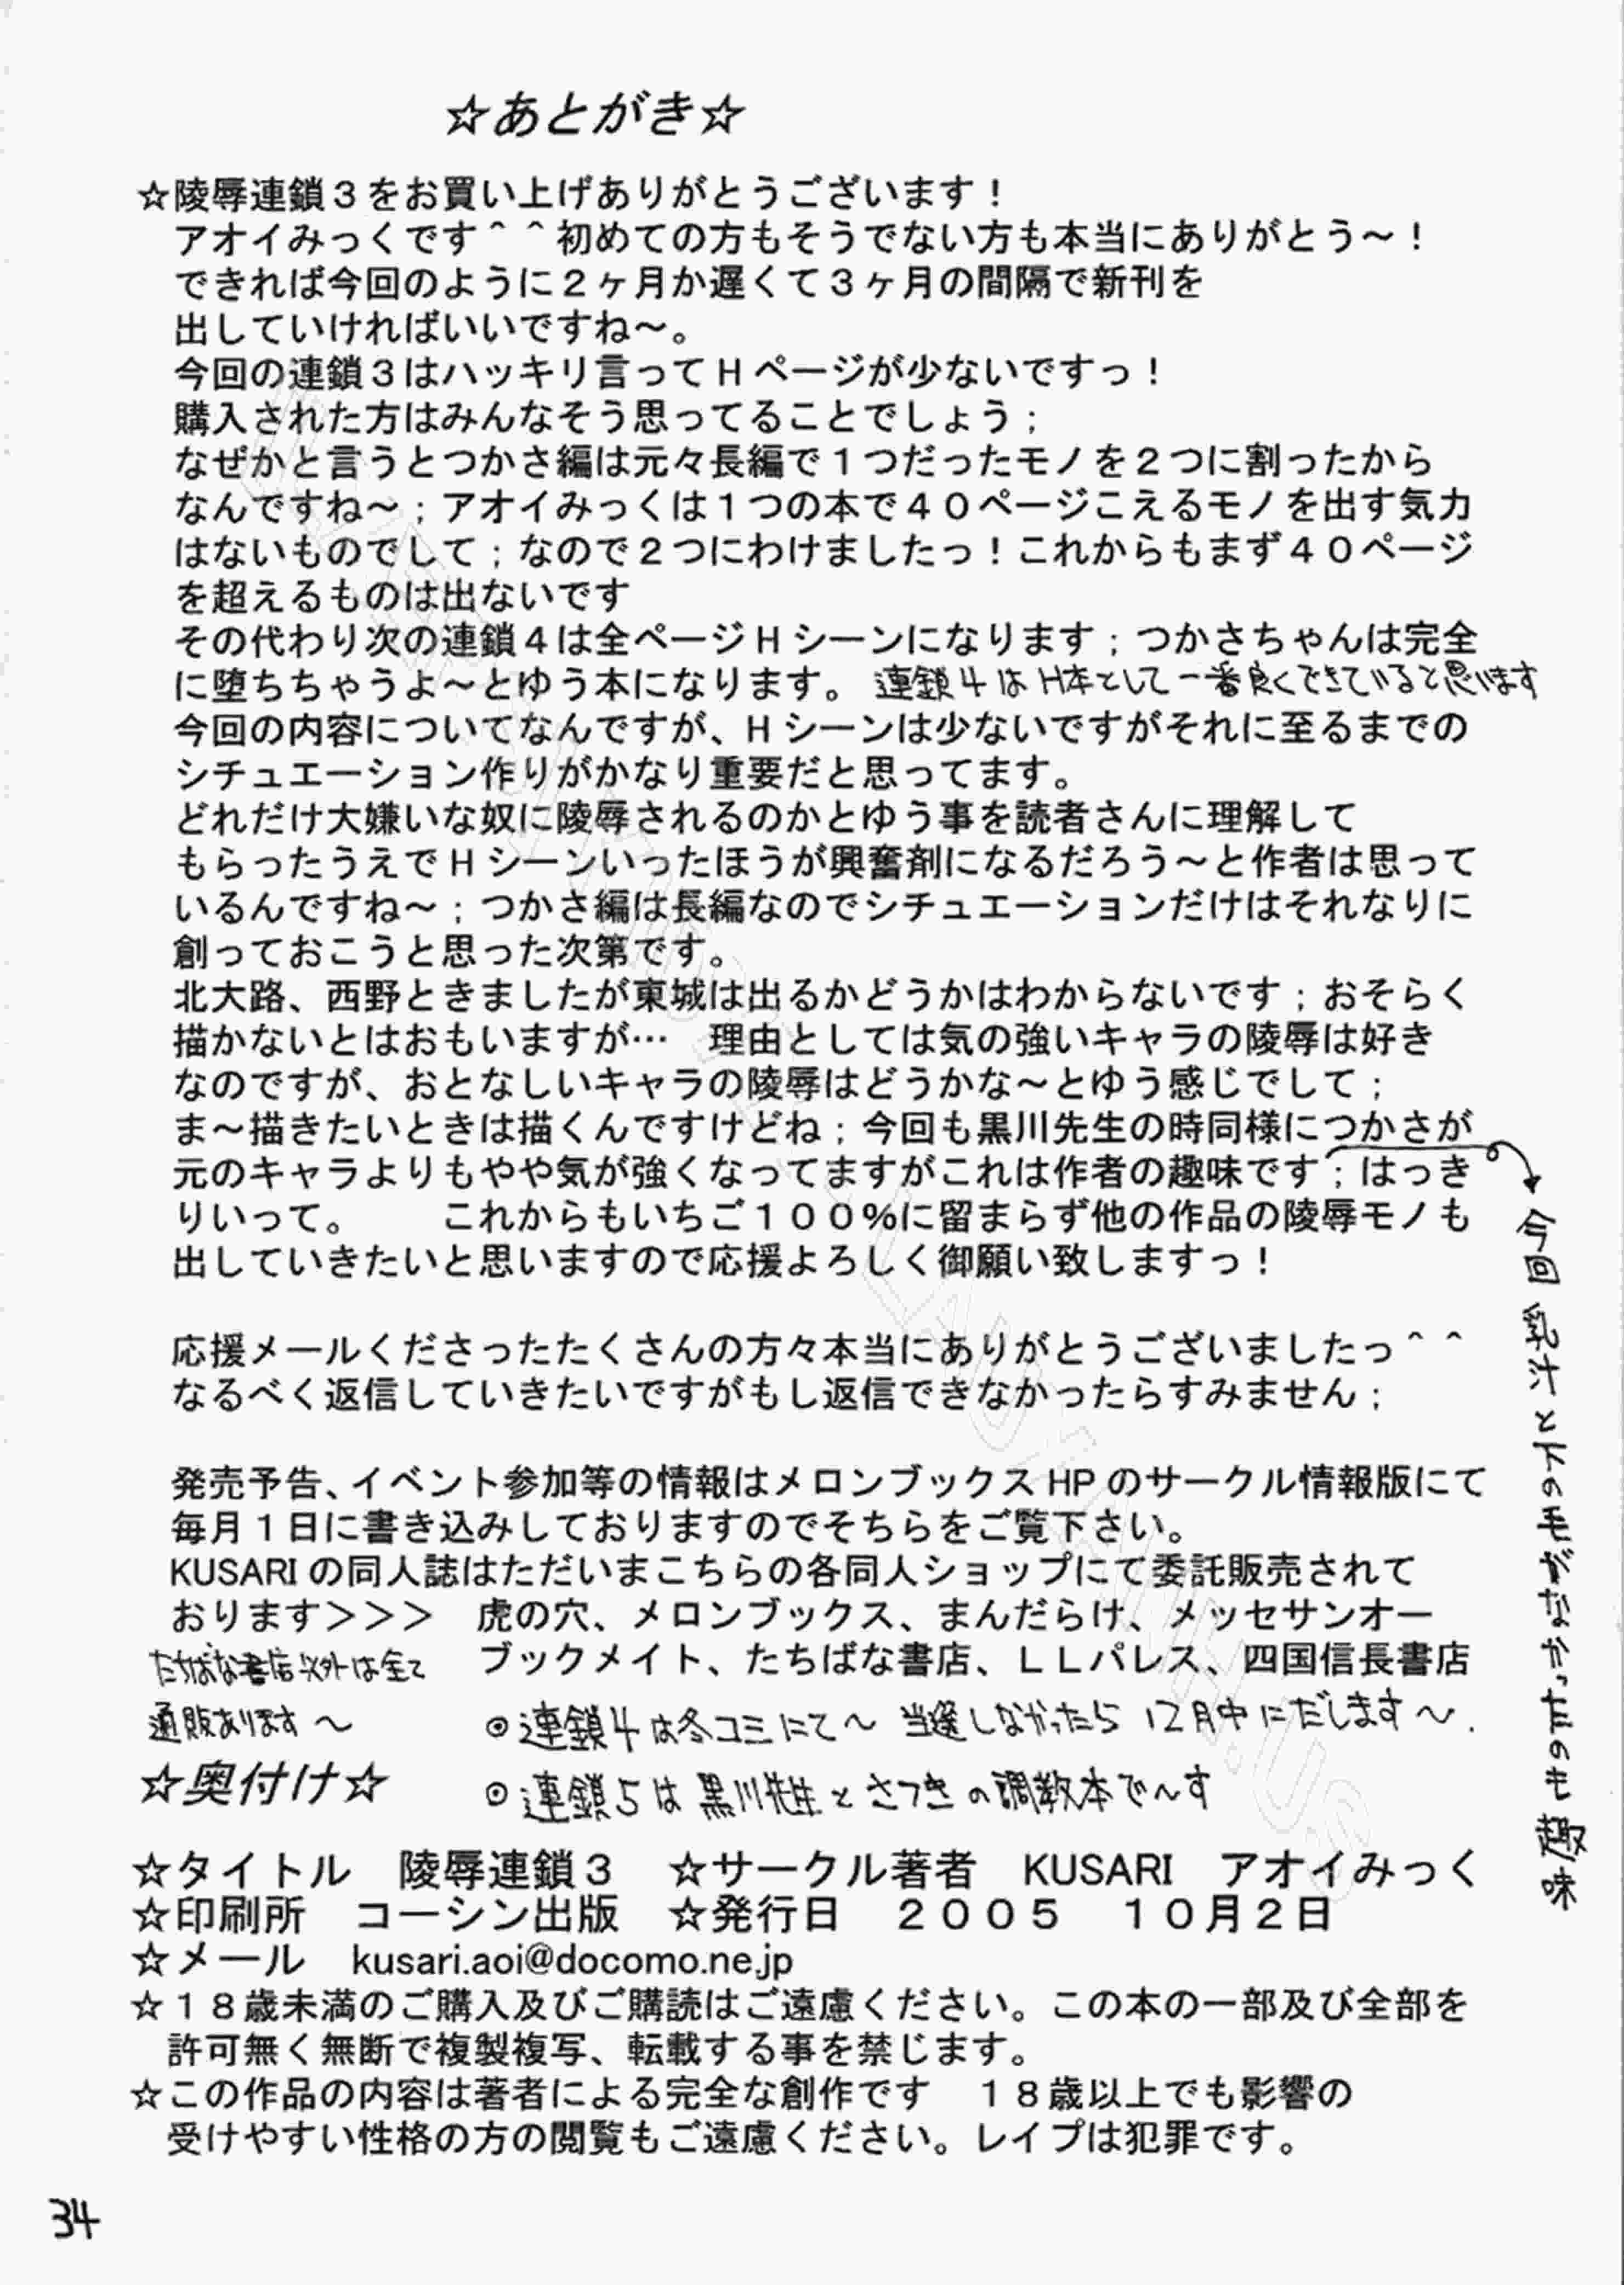 TruyenHay.Com - Ảnh 33 - Ryoujoku Rensa Chapter 3